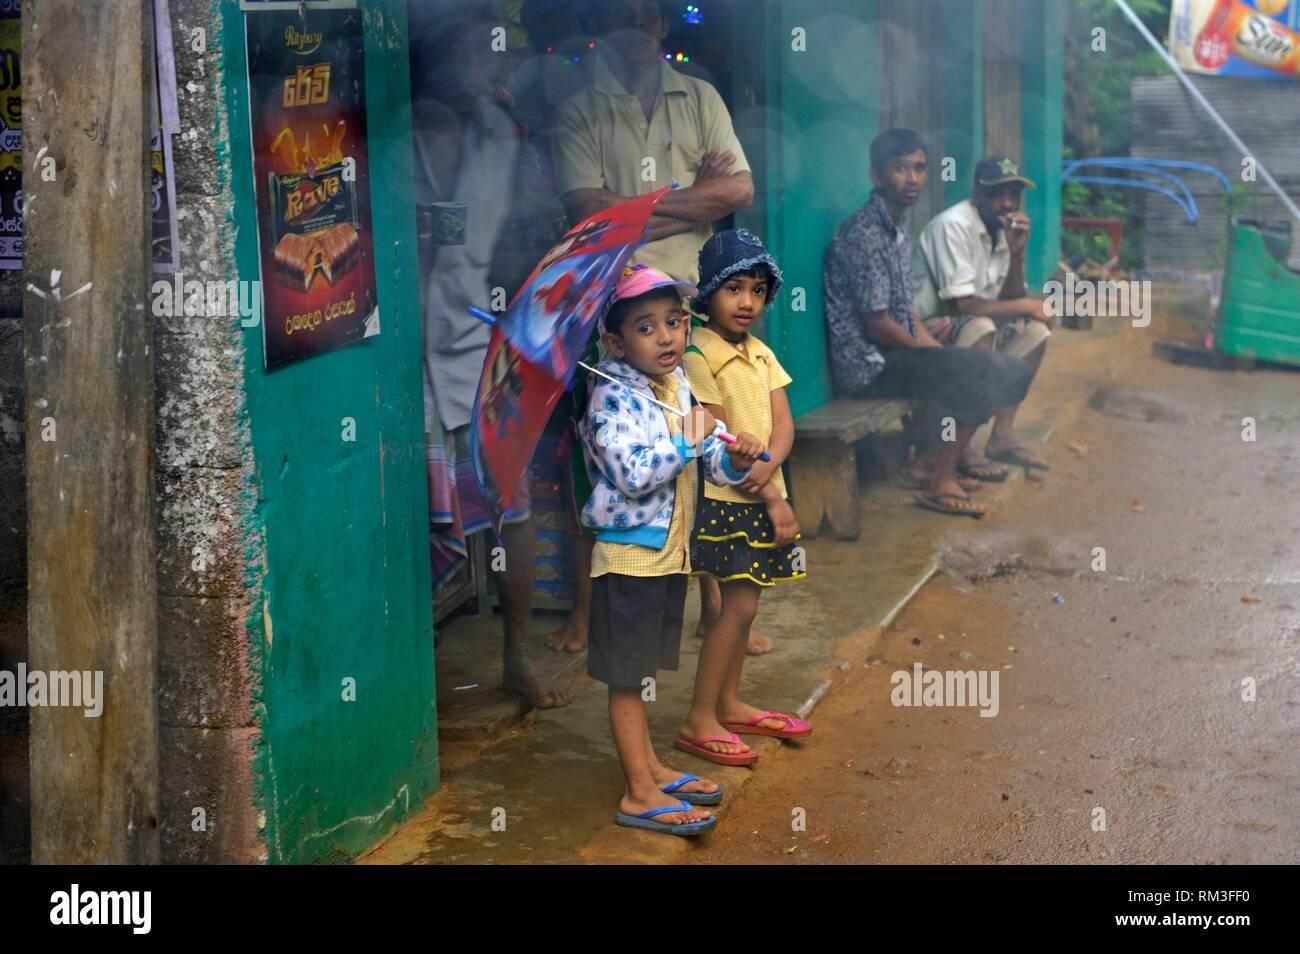 Sri Lanka, Indian subcontinent, South Asia. - Stock Image